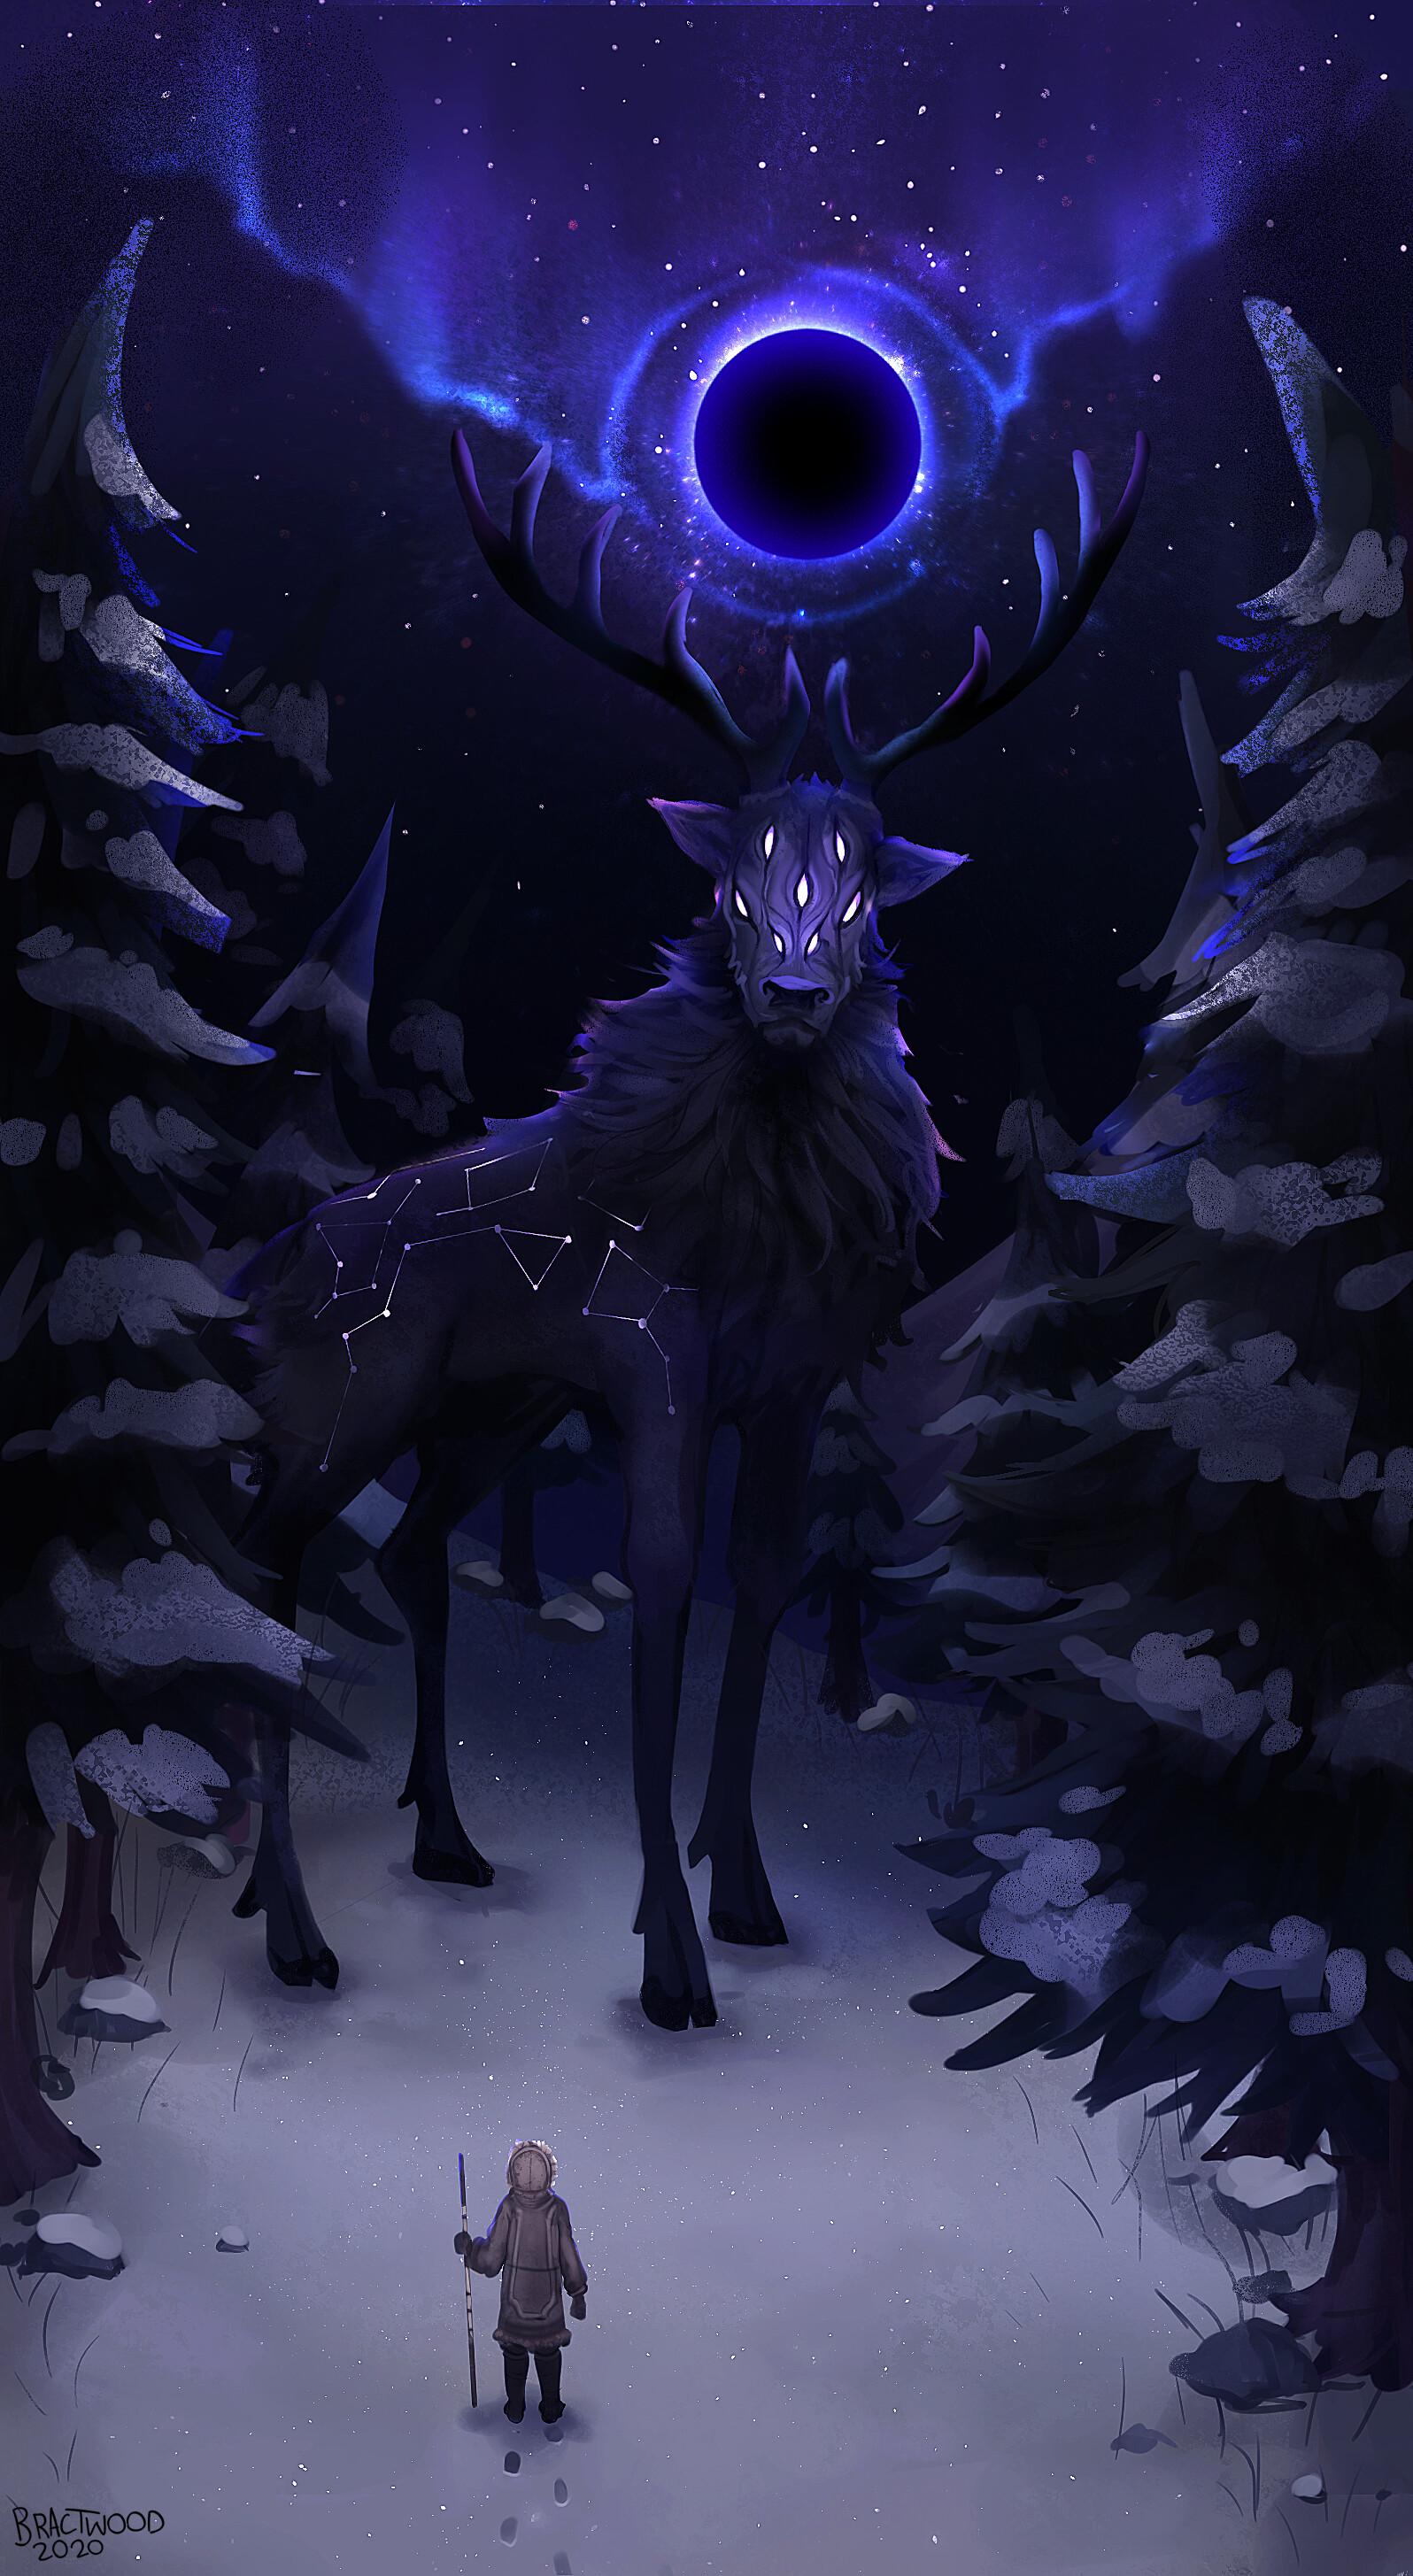 ArtStation - Xeglun - Celestial Elk, Maxine Lugg